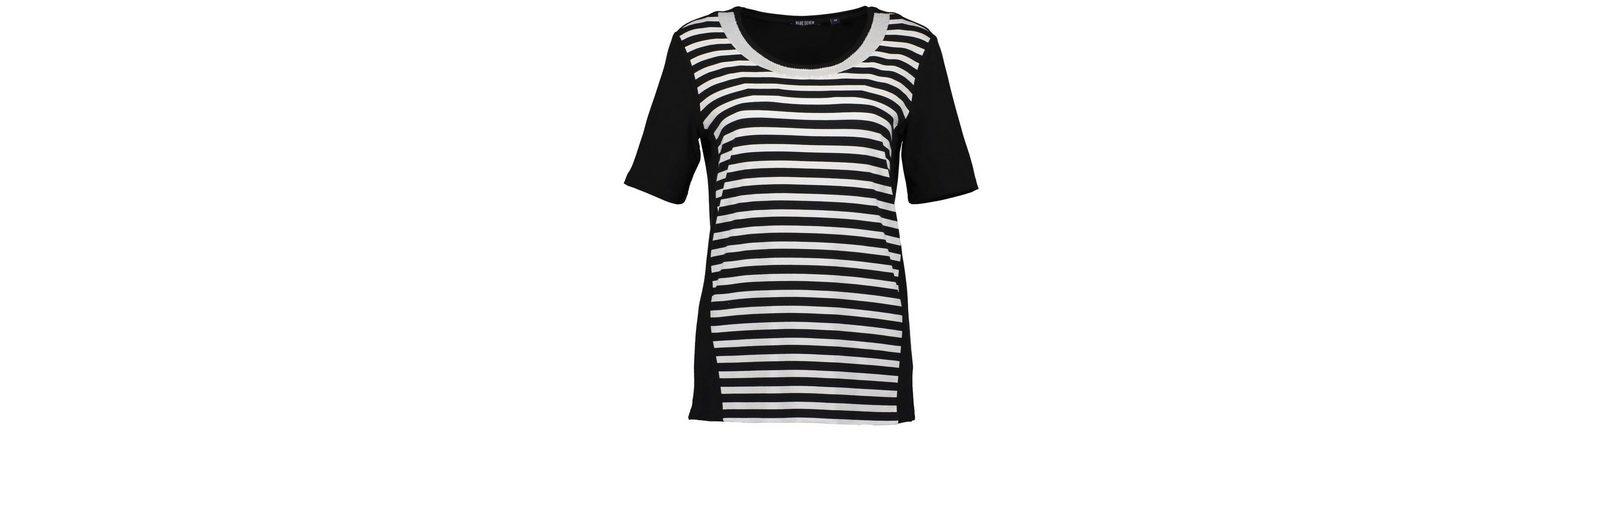 Billig Verkauf Bestes Geschäft Zu Bekommen Blick Zu Verkaufen Blue Seven T-Shirt mit Pailletten CD4mrg1G3